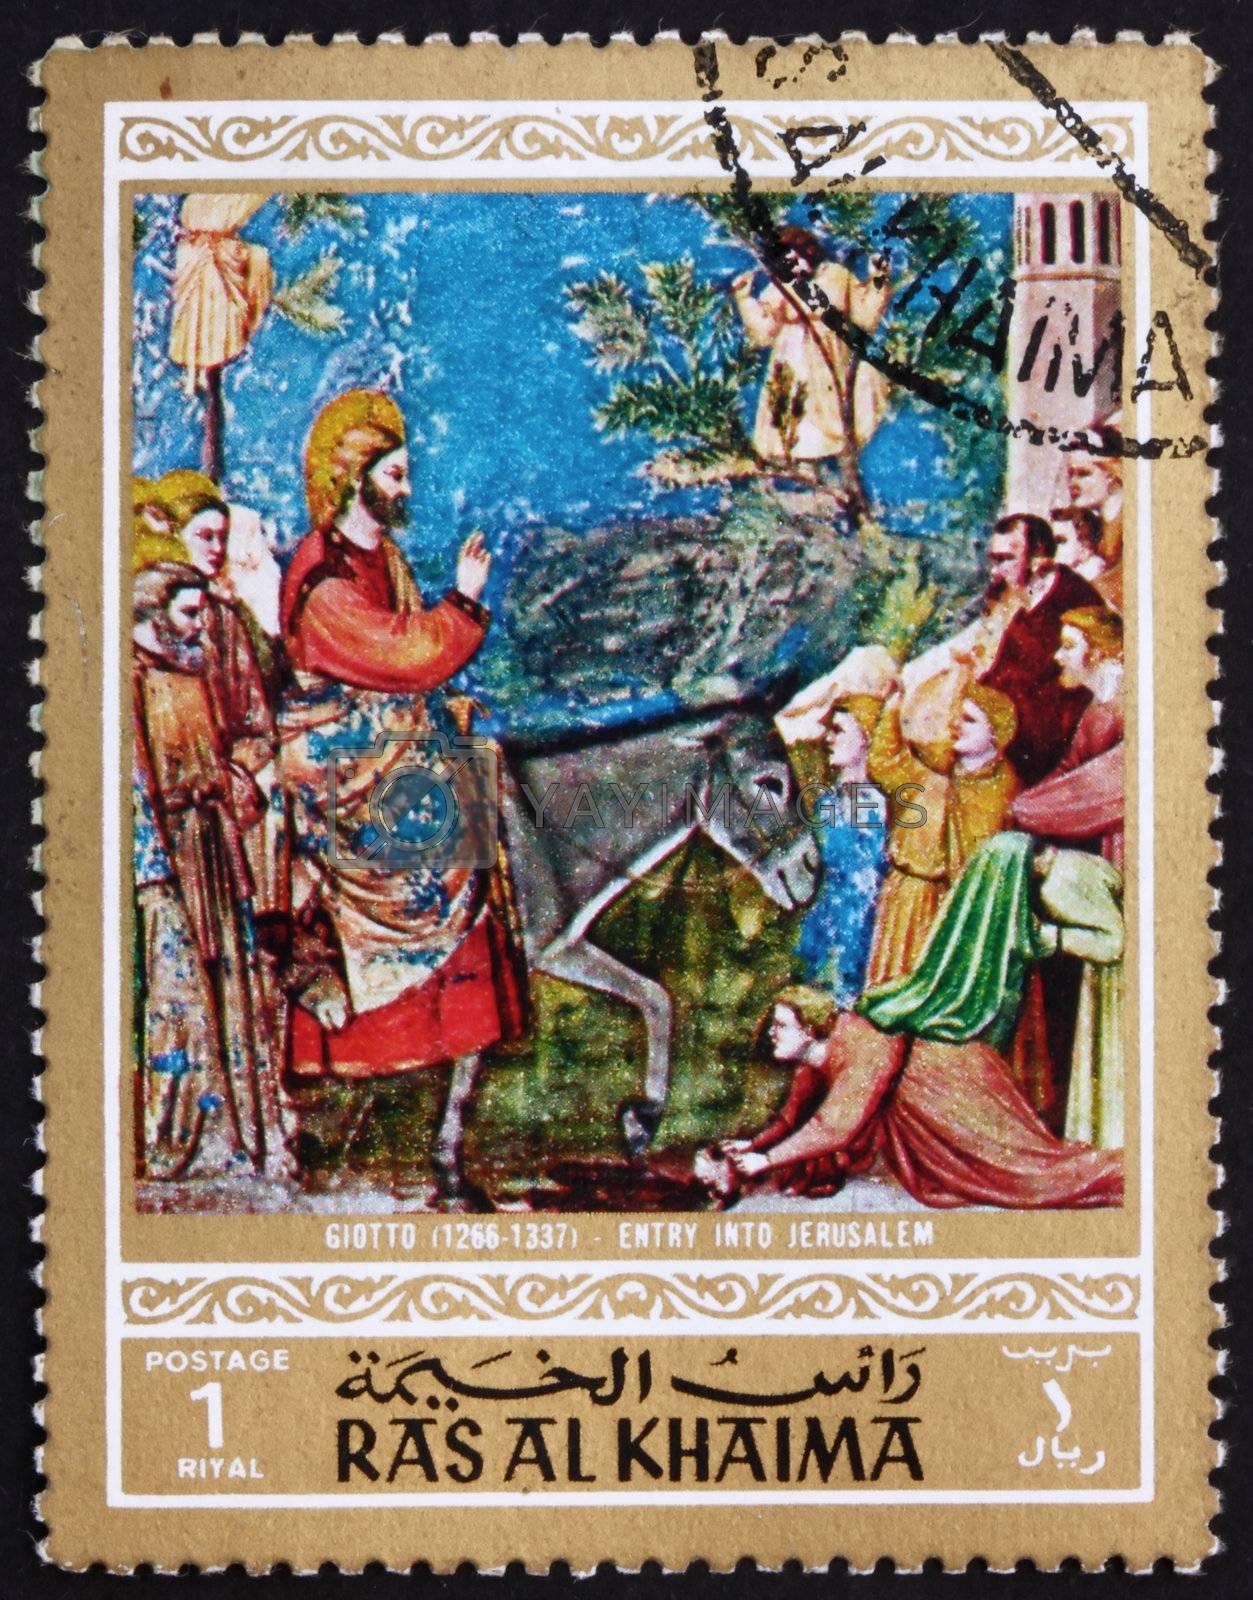 RAS AL-KHAIMAH - CIRCA 1970: a stamp printed in the Ras al-Khaimah shows Entry into Jerusalem, Painting by Giotto di Bondone, Life of Jesus Christ, circa 1970